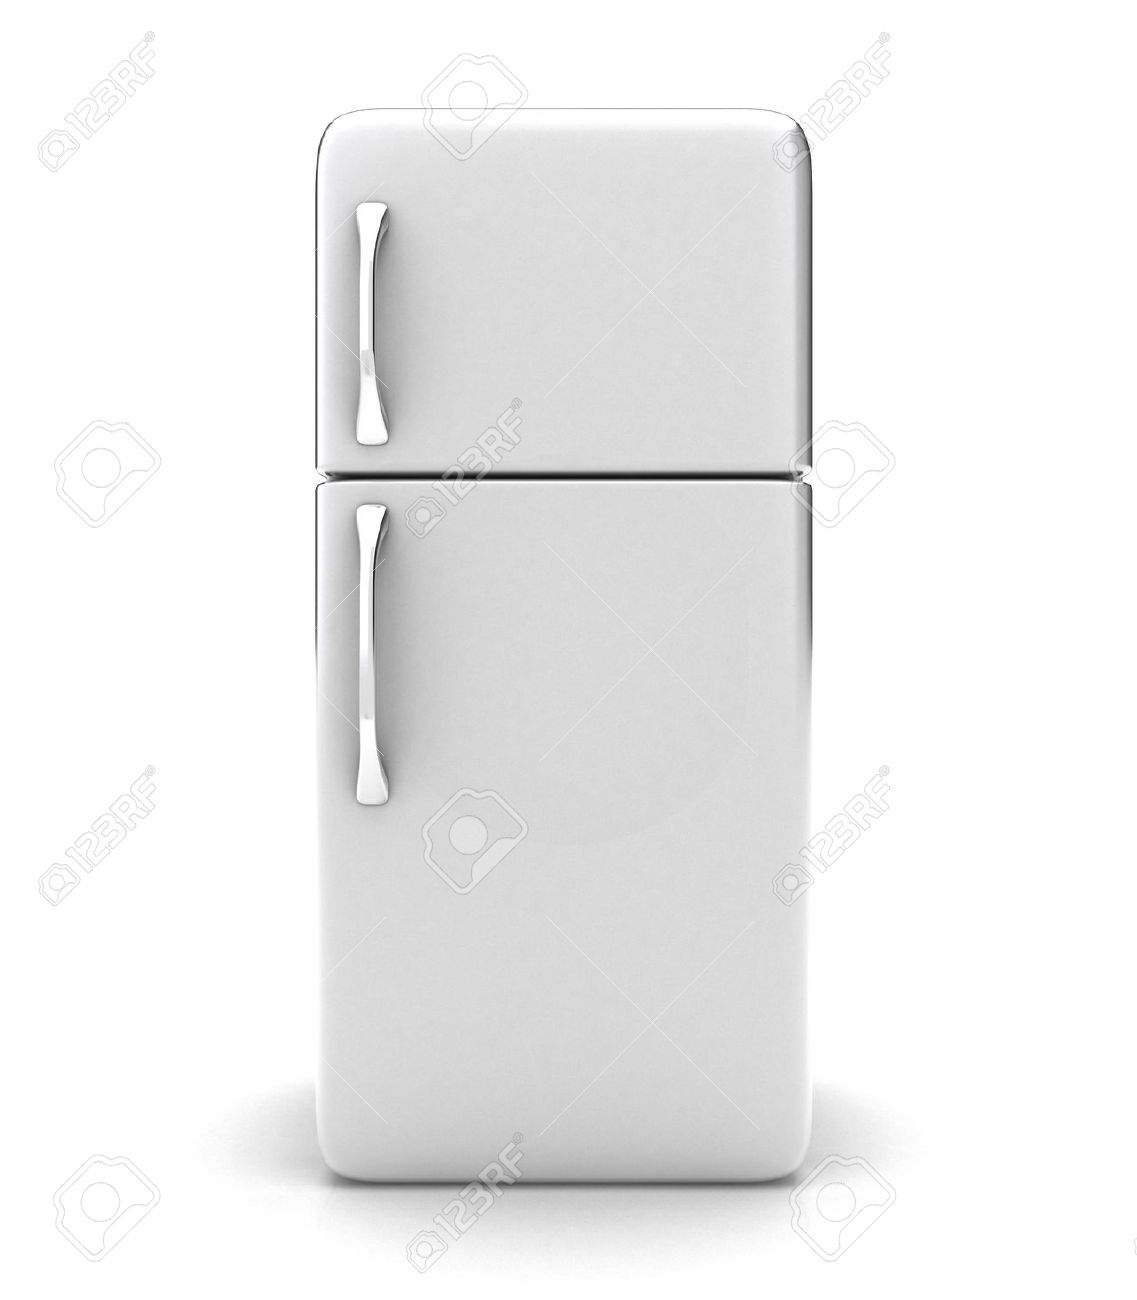 Illustration Of A New Fridge On A White Background Stock Photo 1137x1300